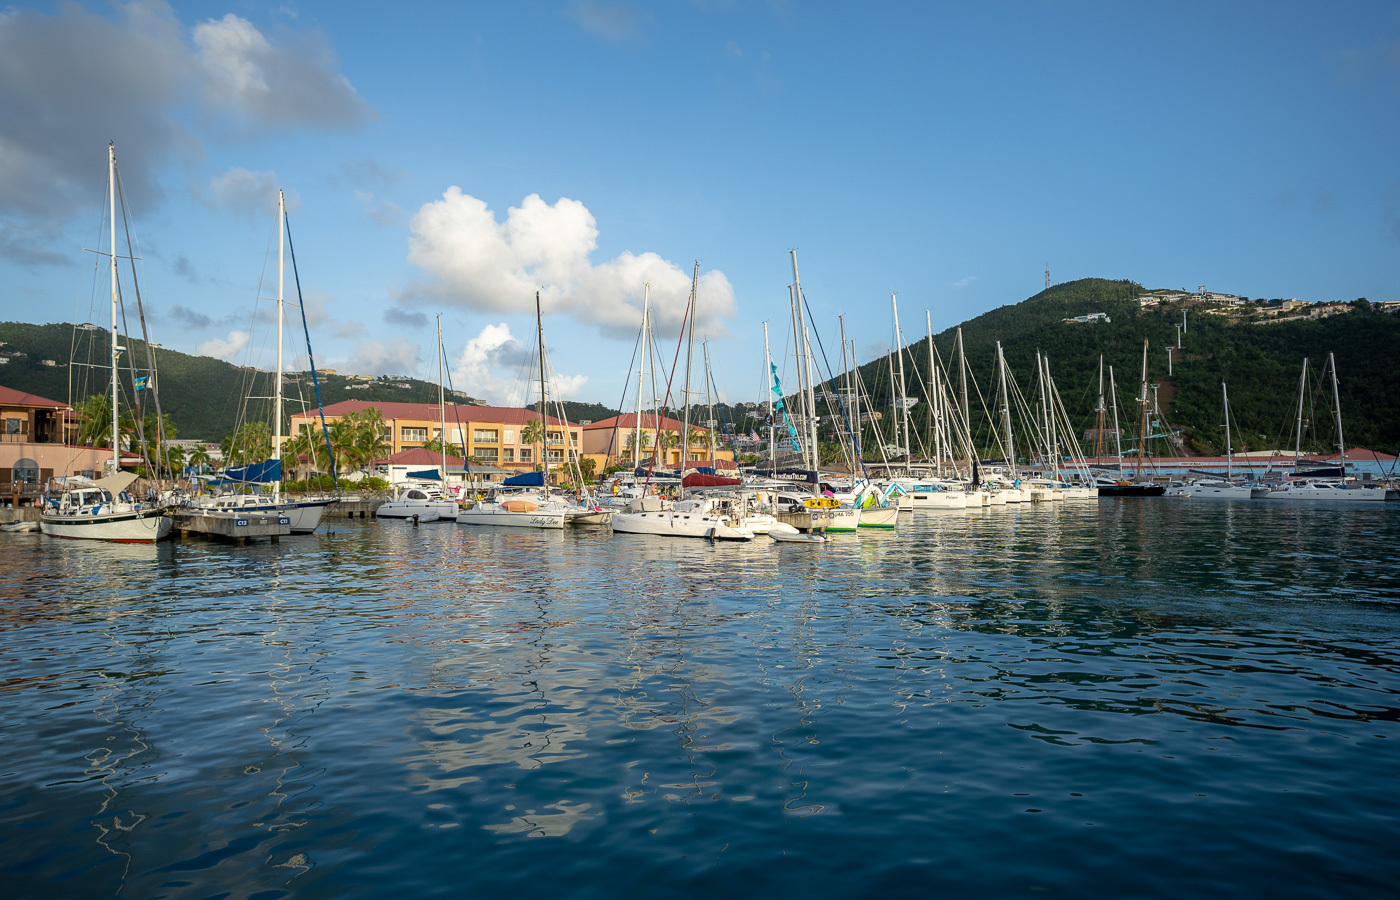 Virgin Islands Charter Yacht Shows Will Return [BVI + USVI]